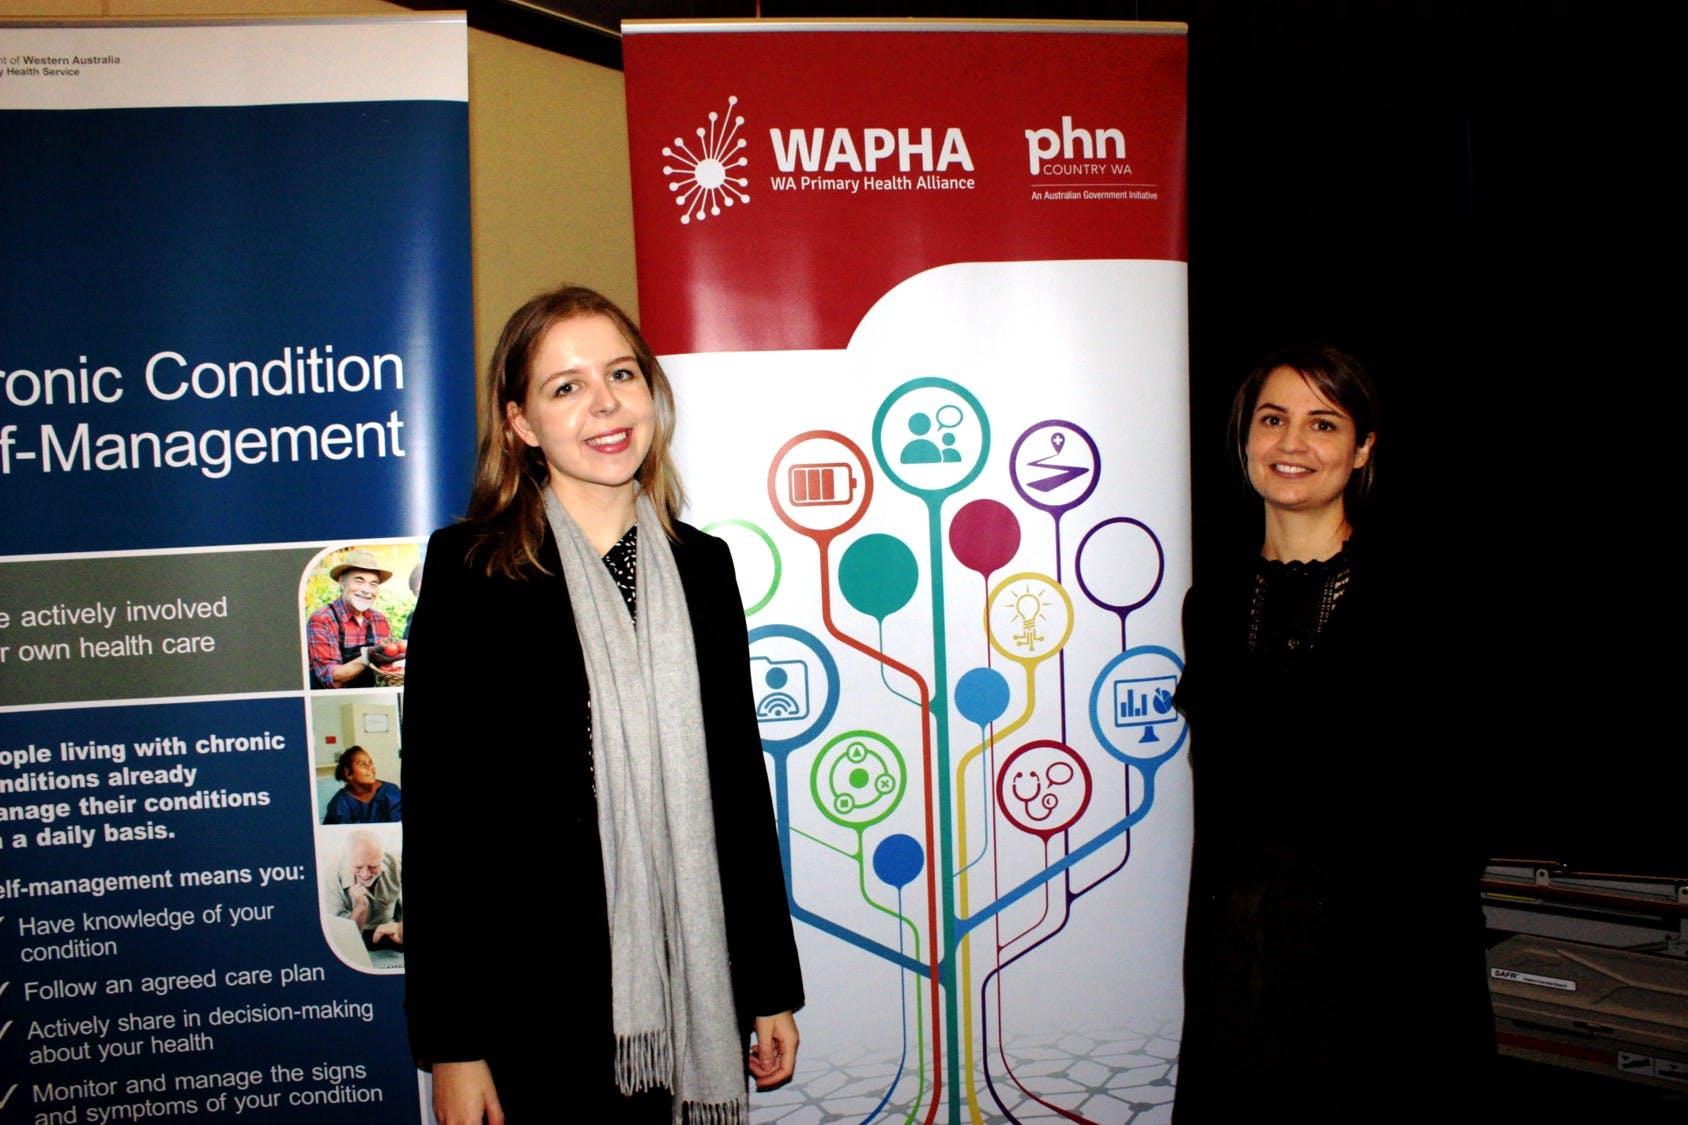 HealthPathways WA & Health Consumers' Council